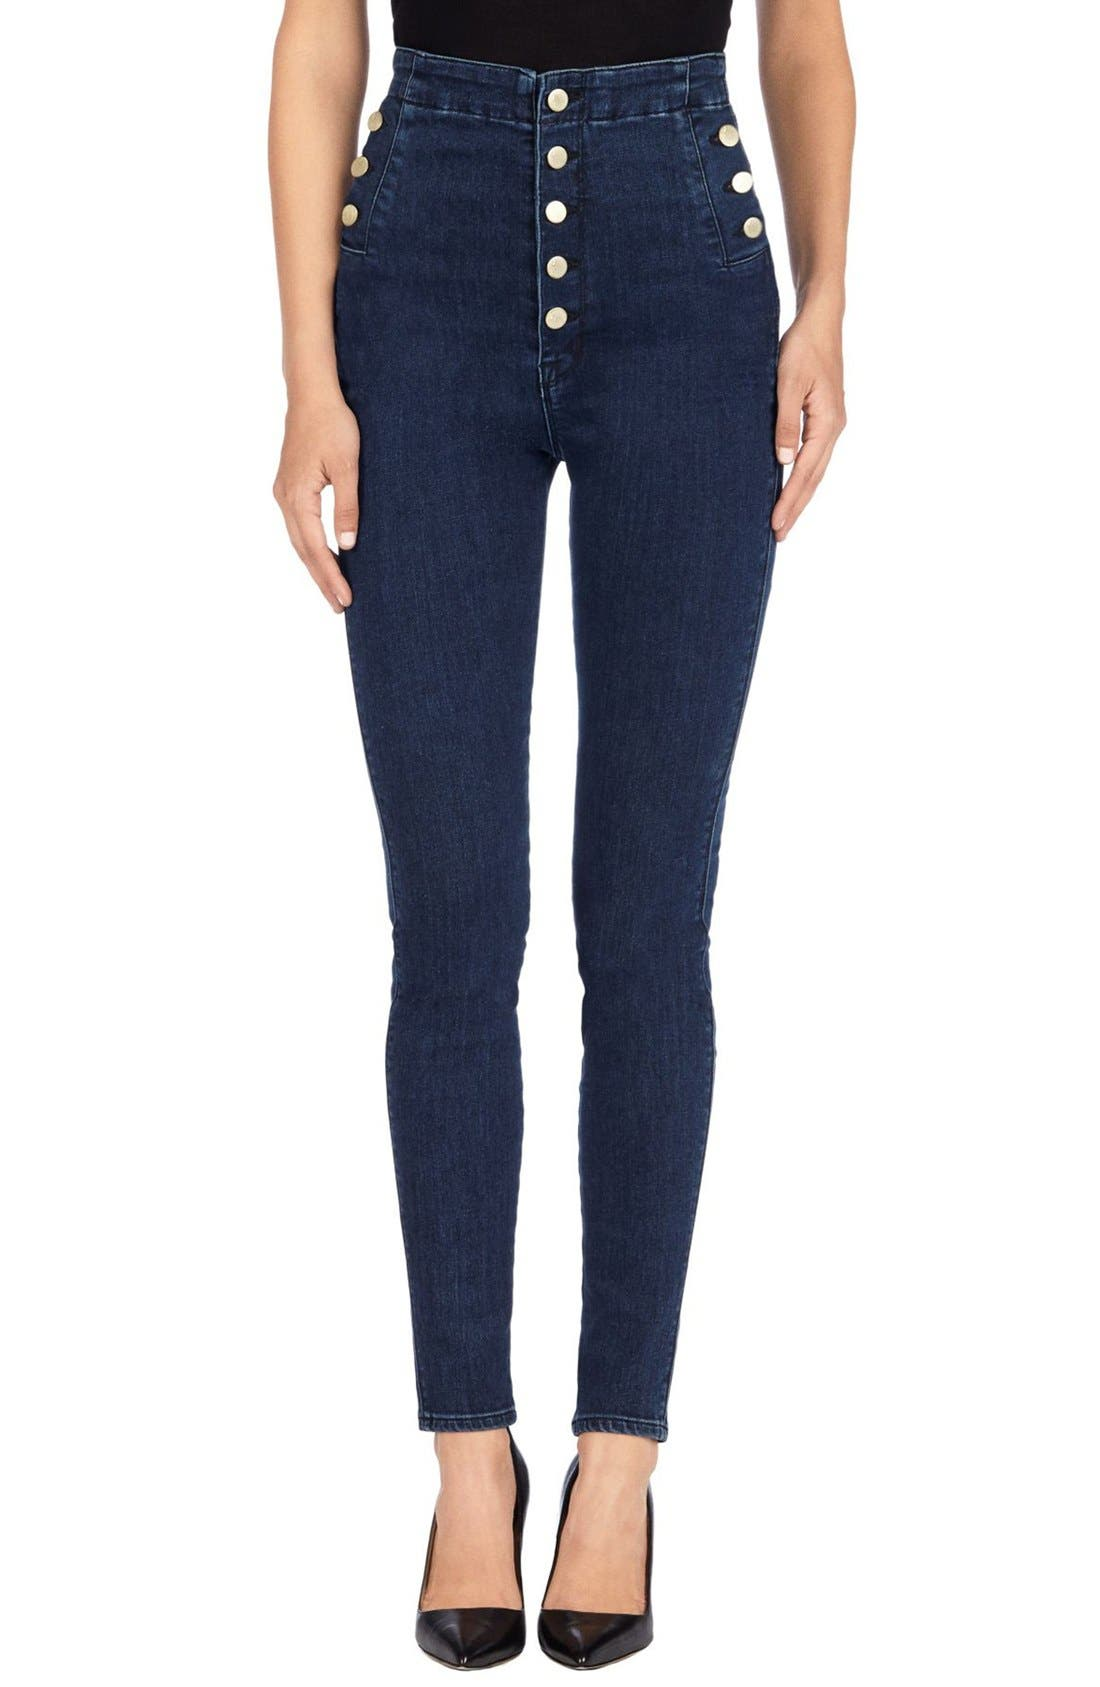 'Natasha Sky High' High Rise Skinny Jeans,                             Main thumbnail 1, color,                             410